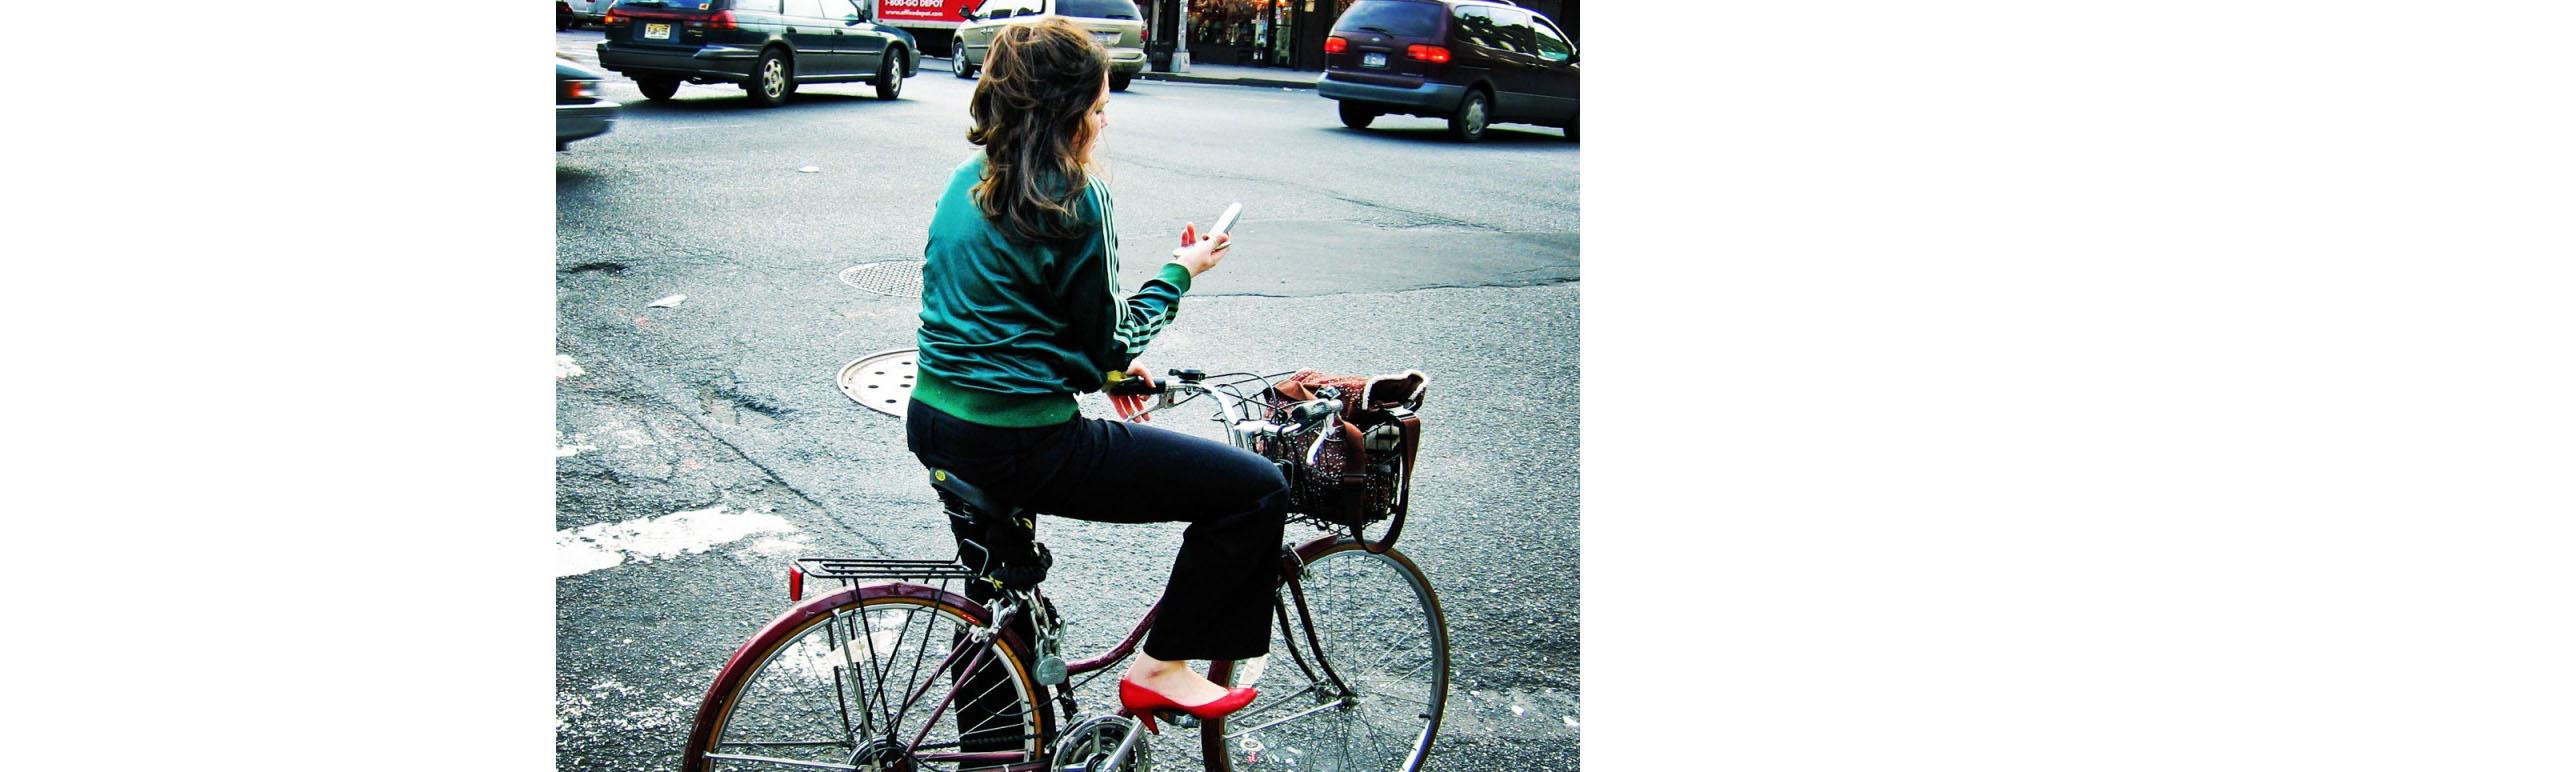 grand-street-texting-blog